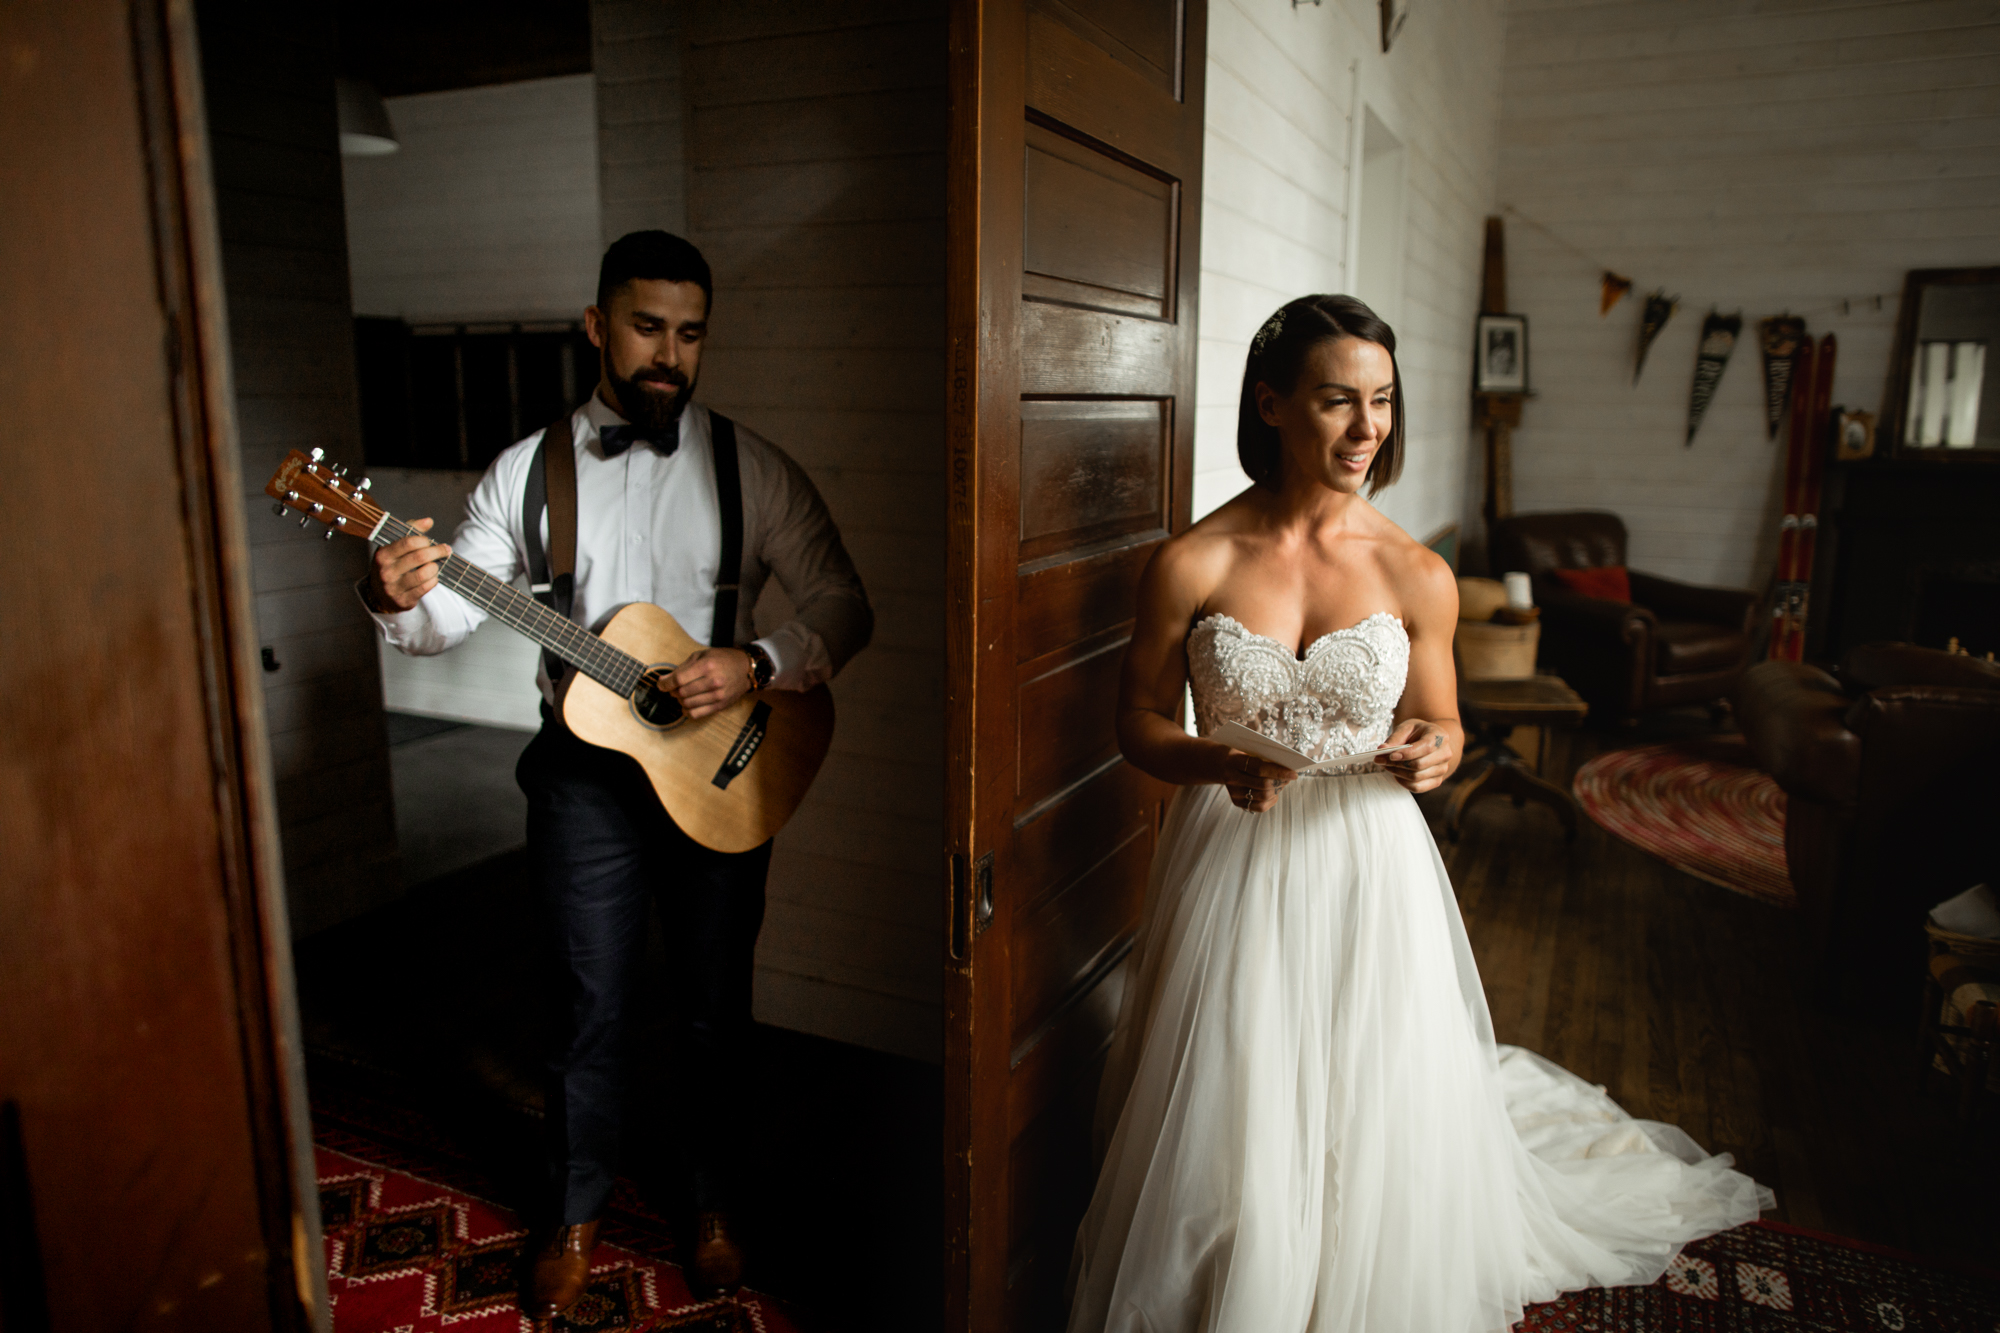 31-Willow_and_Wolf_Wedding_Photography_Charlene_and_Tyler_Revelstoke_British_Columbia_Canada_Waterfall_Mountain_Elopement_BegbieFalls_Wedding_Blog_ATP_2609.jpg